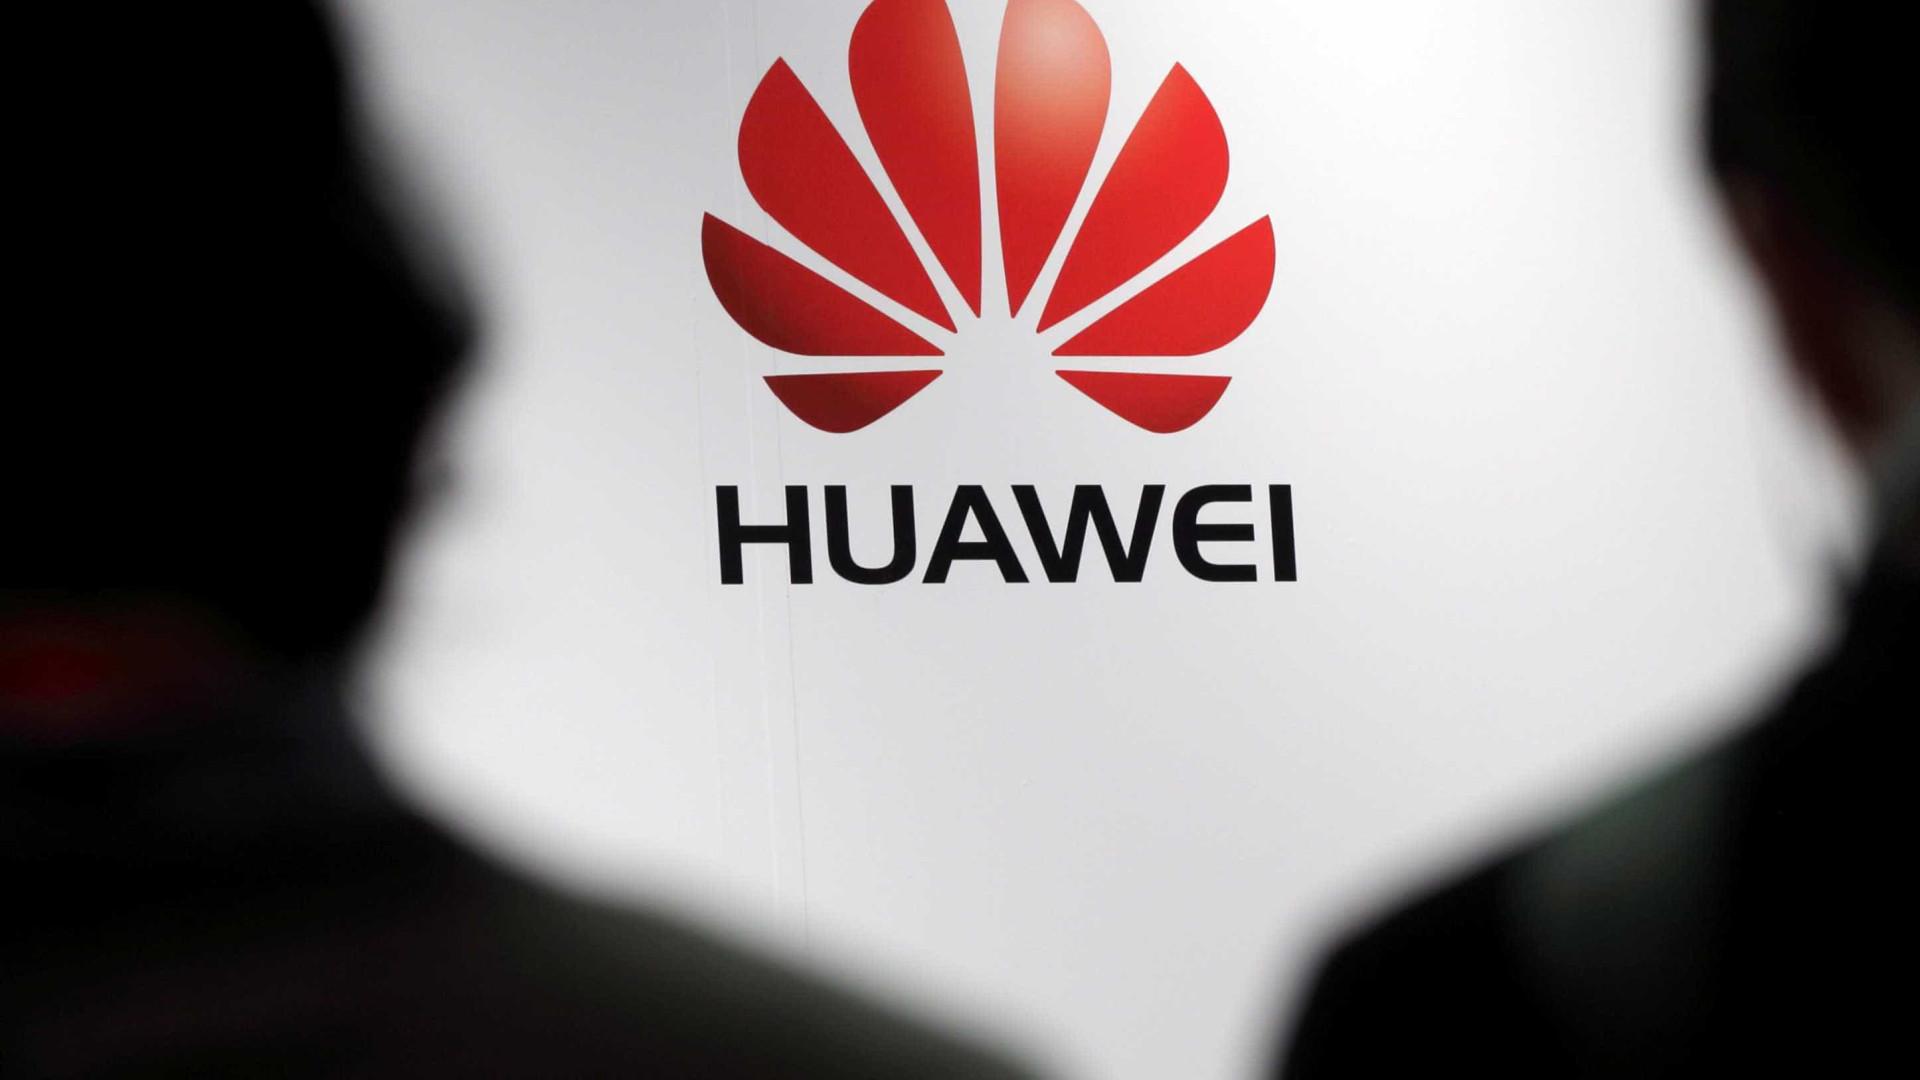 Próximo topo de gama da Huawei pode ter ecrã curvo